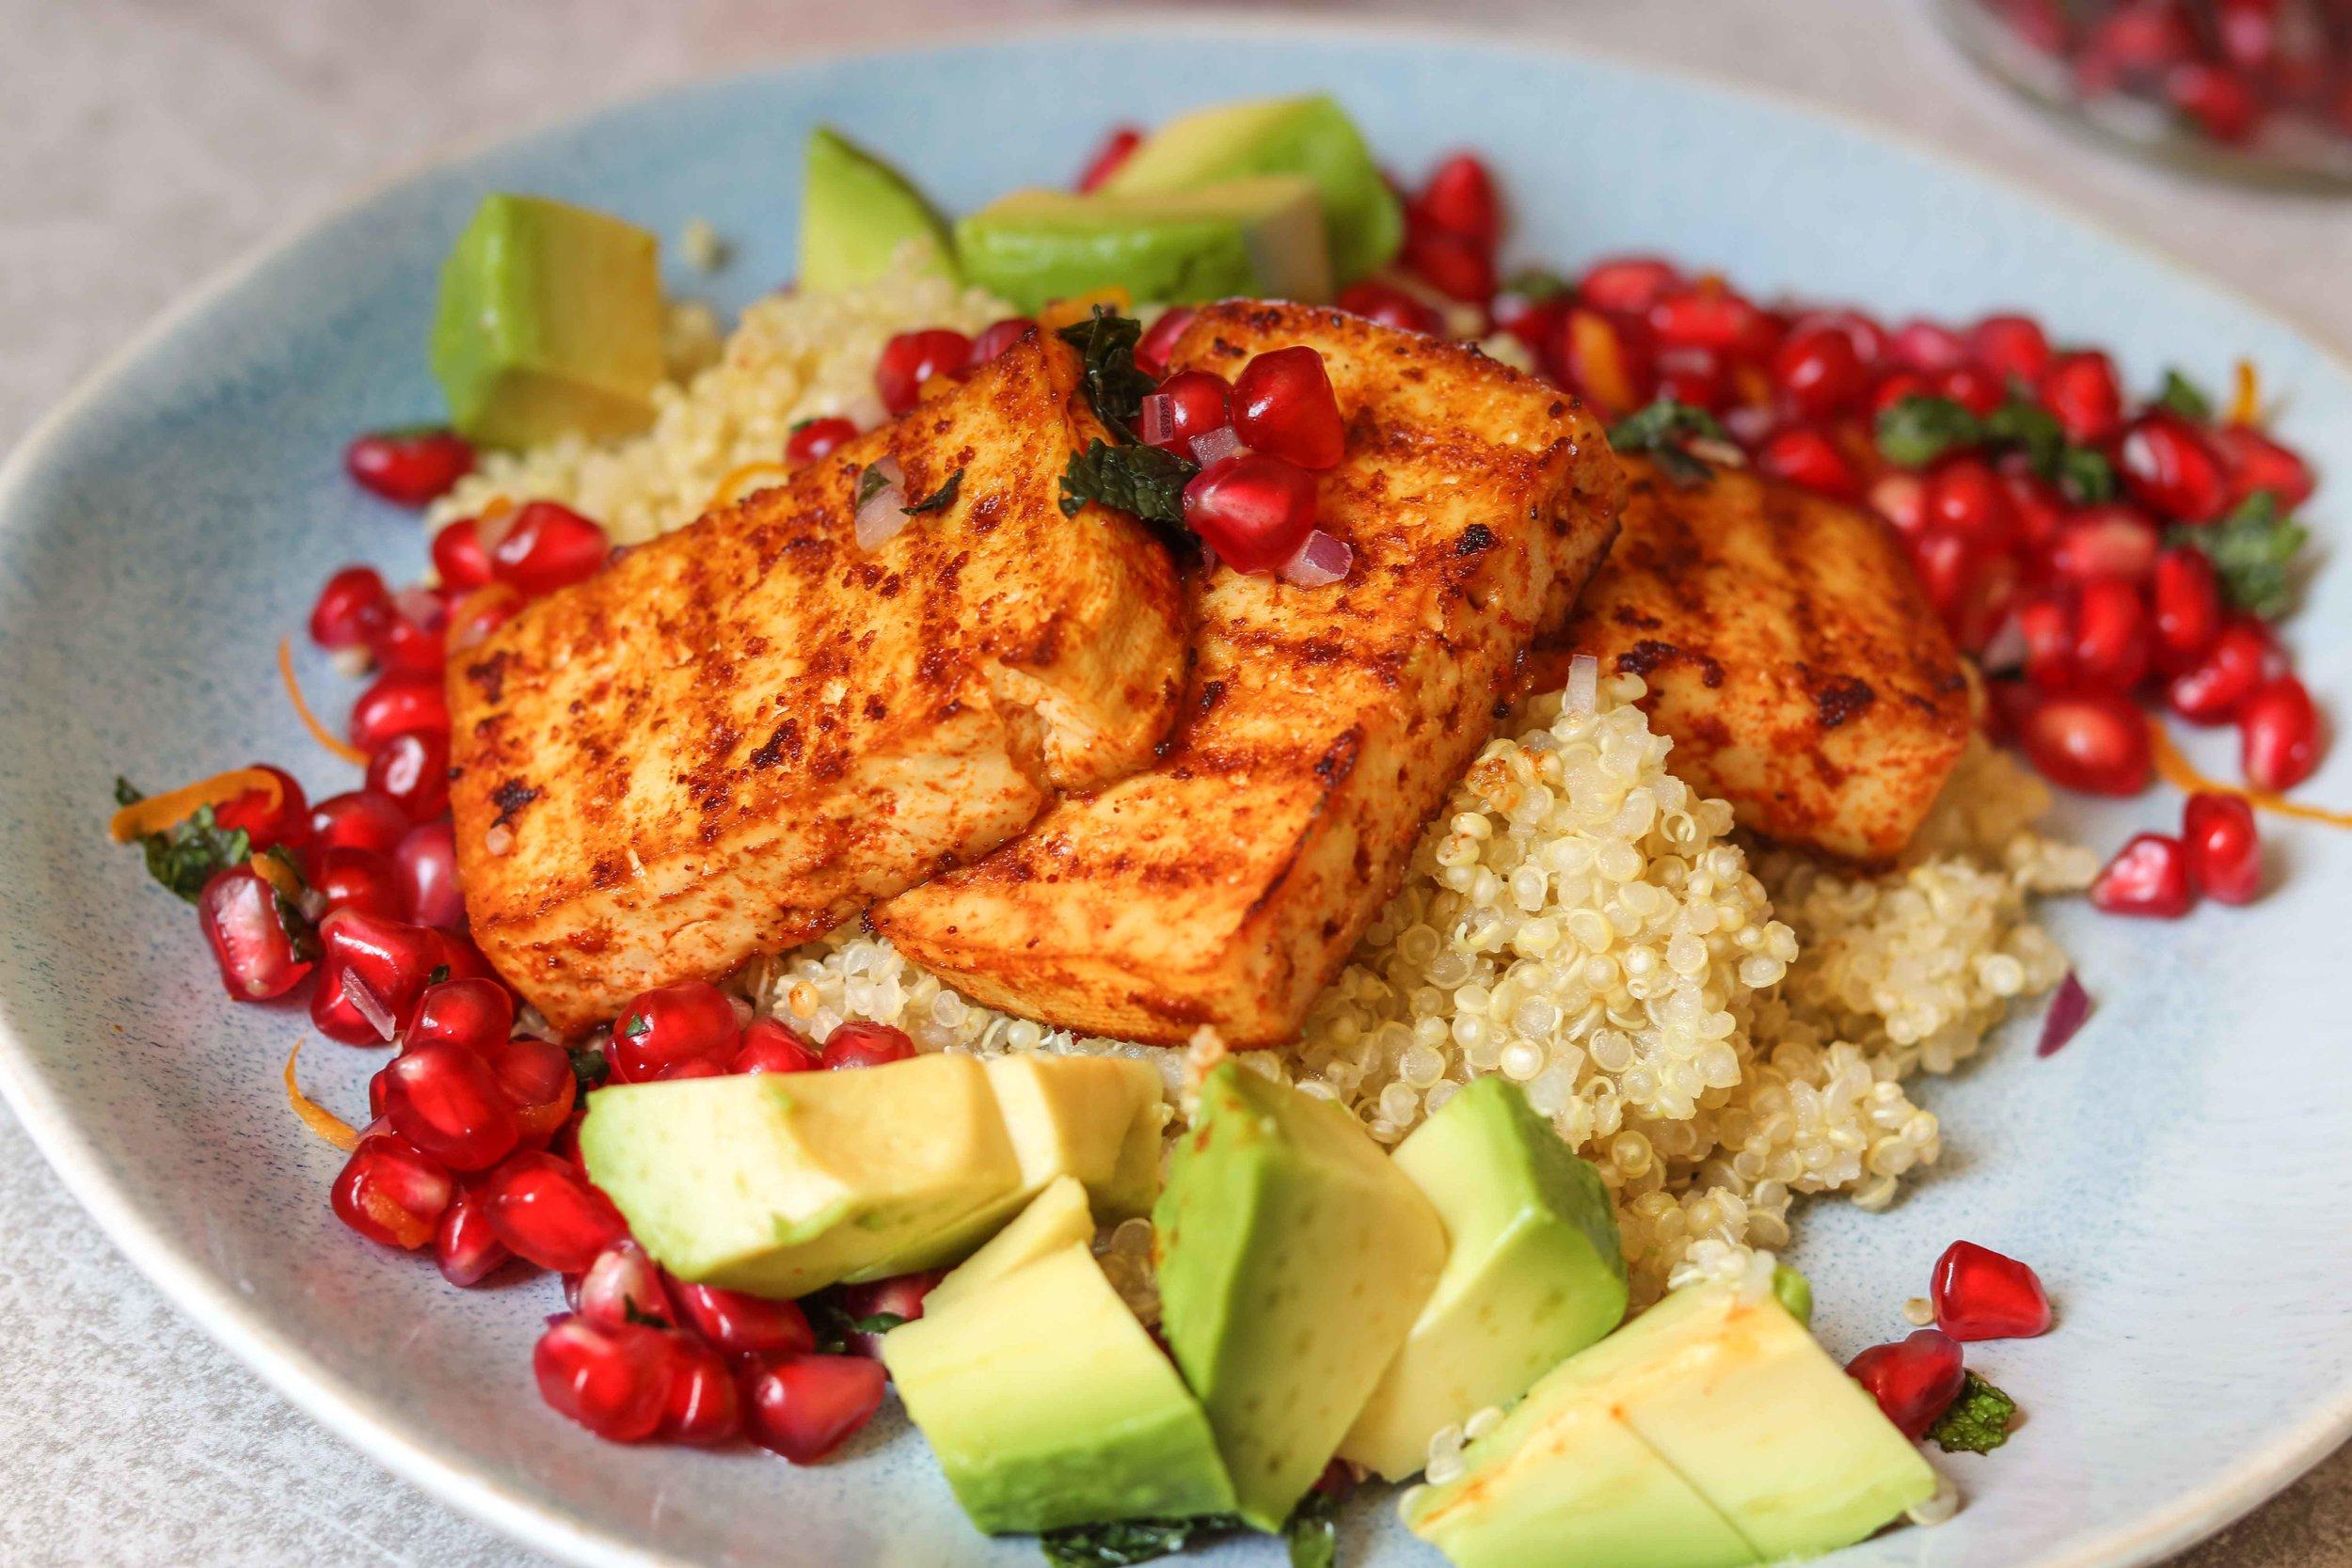 quinoa-chili-tofu-salad-6.jpg